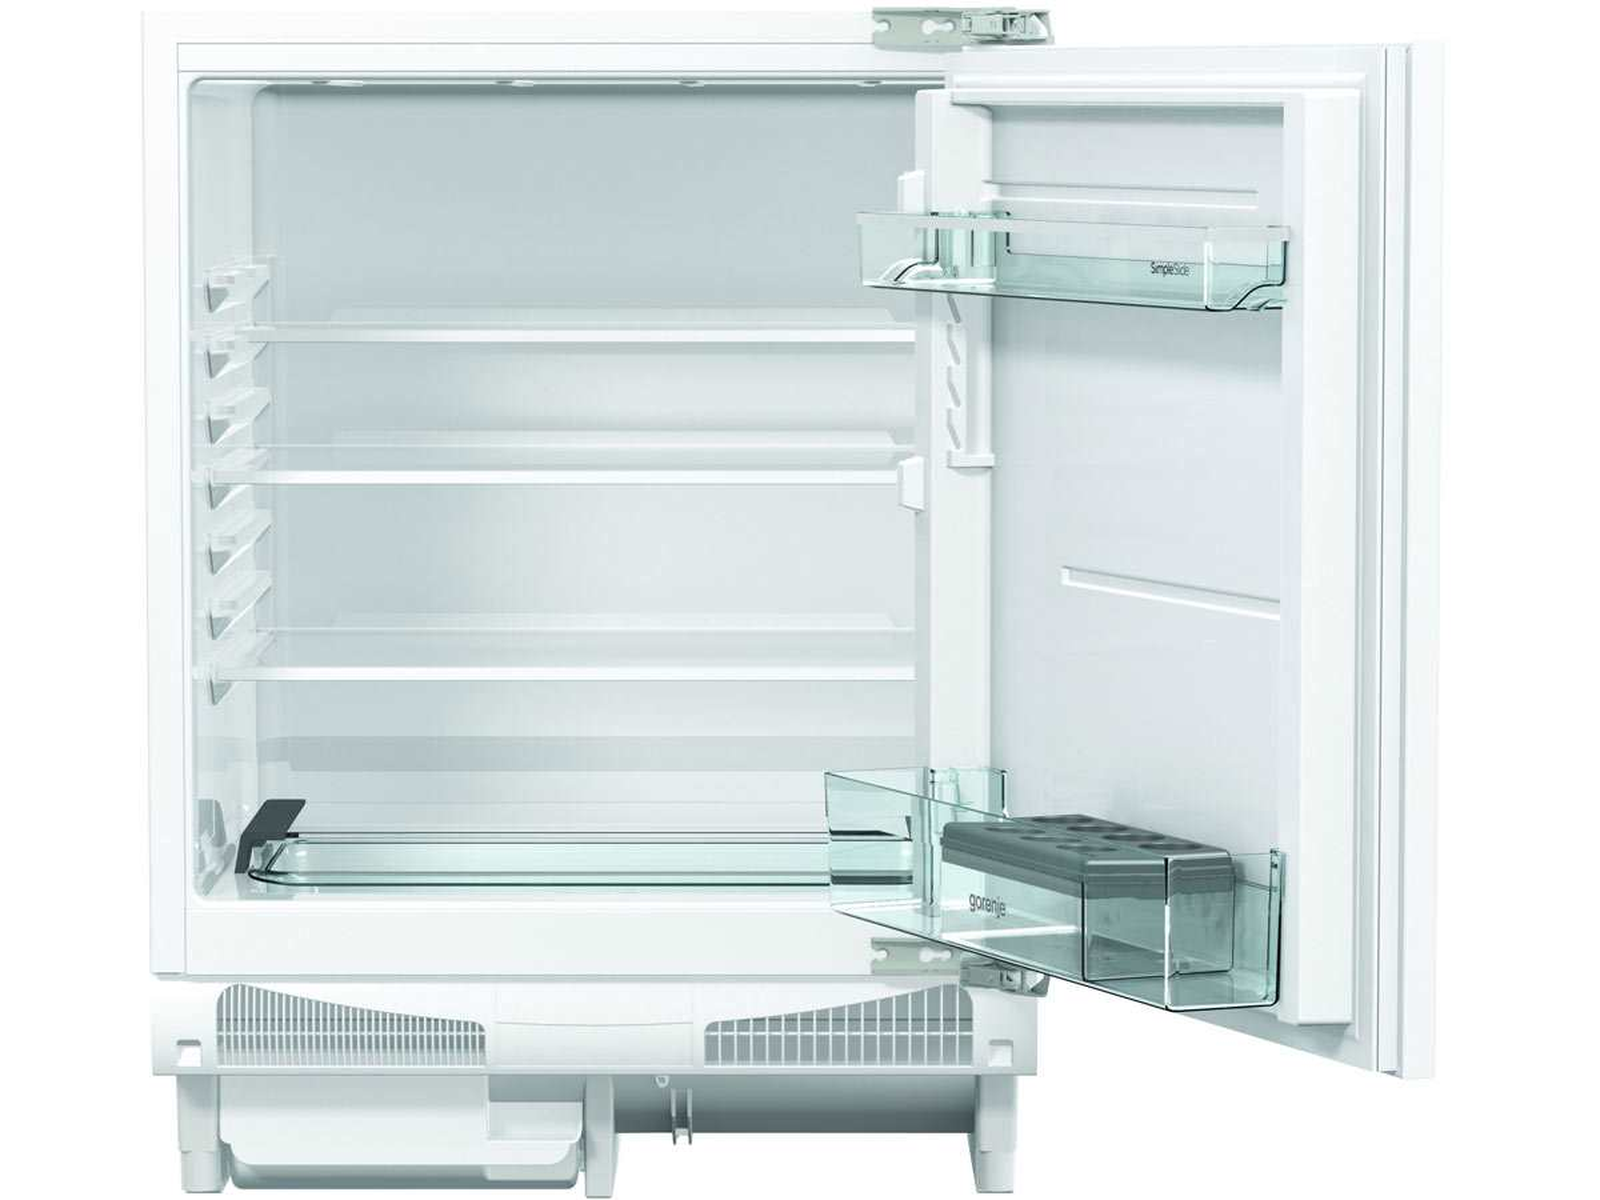 Gorenje Kühlschrank Filter : Gorenje riu aw unterbaukühlschrank